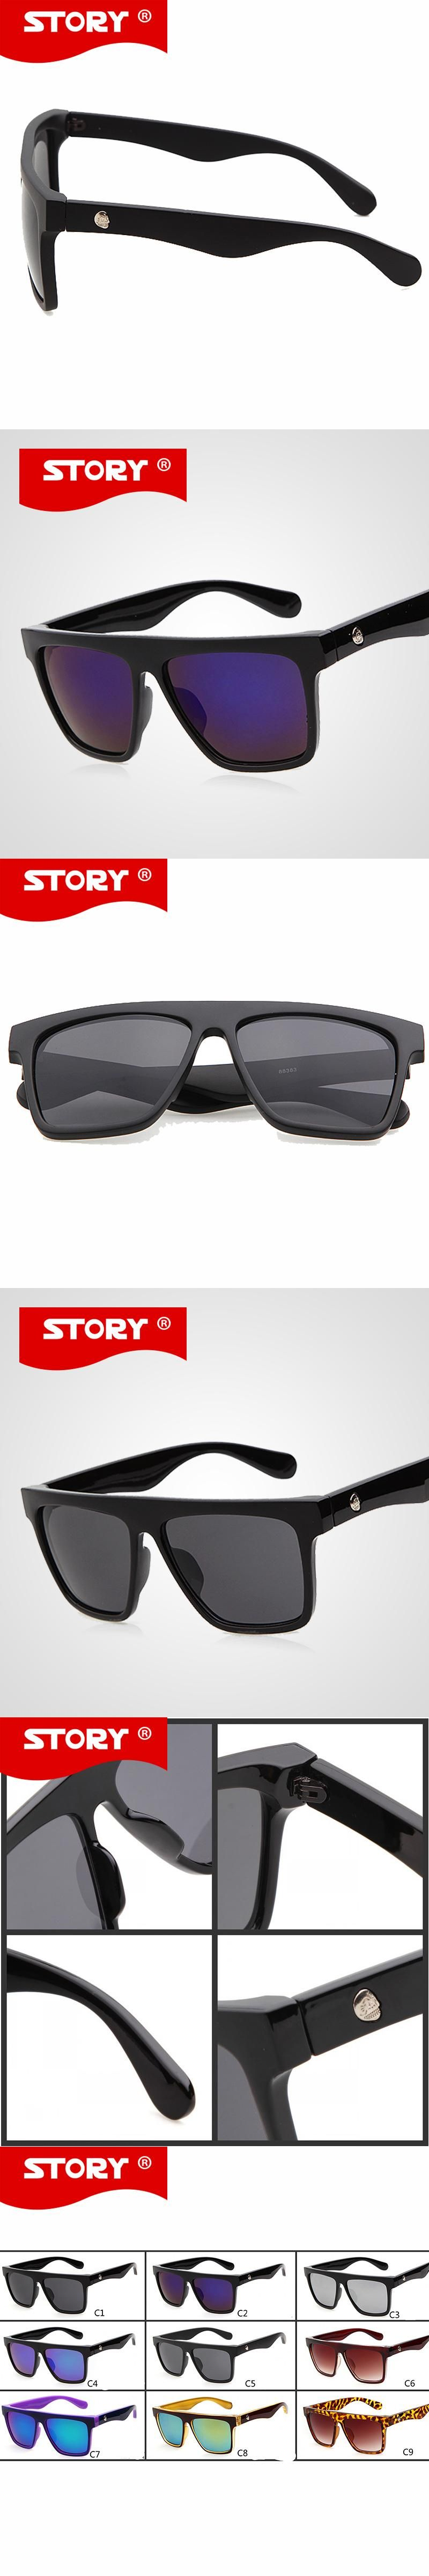 44c011073b7 STORY 2016 Retro Steampunk Square Sunglasses Mens Famous Brand SKULL Logo  Reflective Coating Big Frame Sun